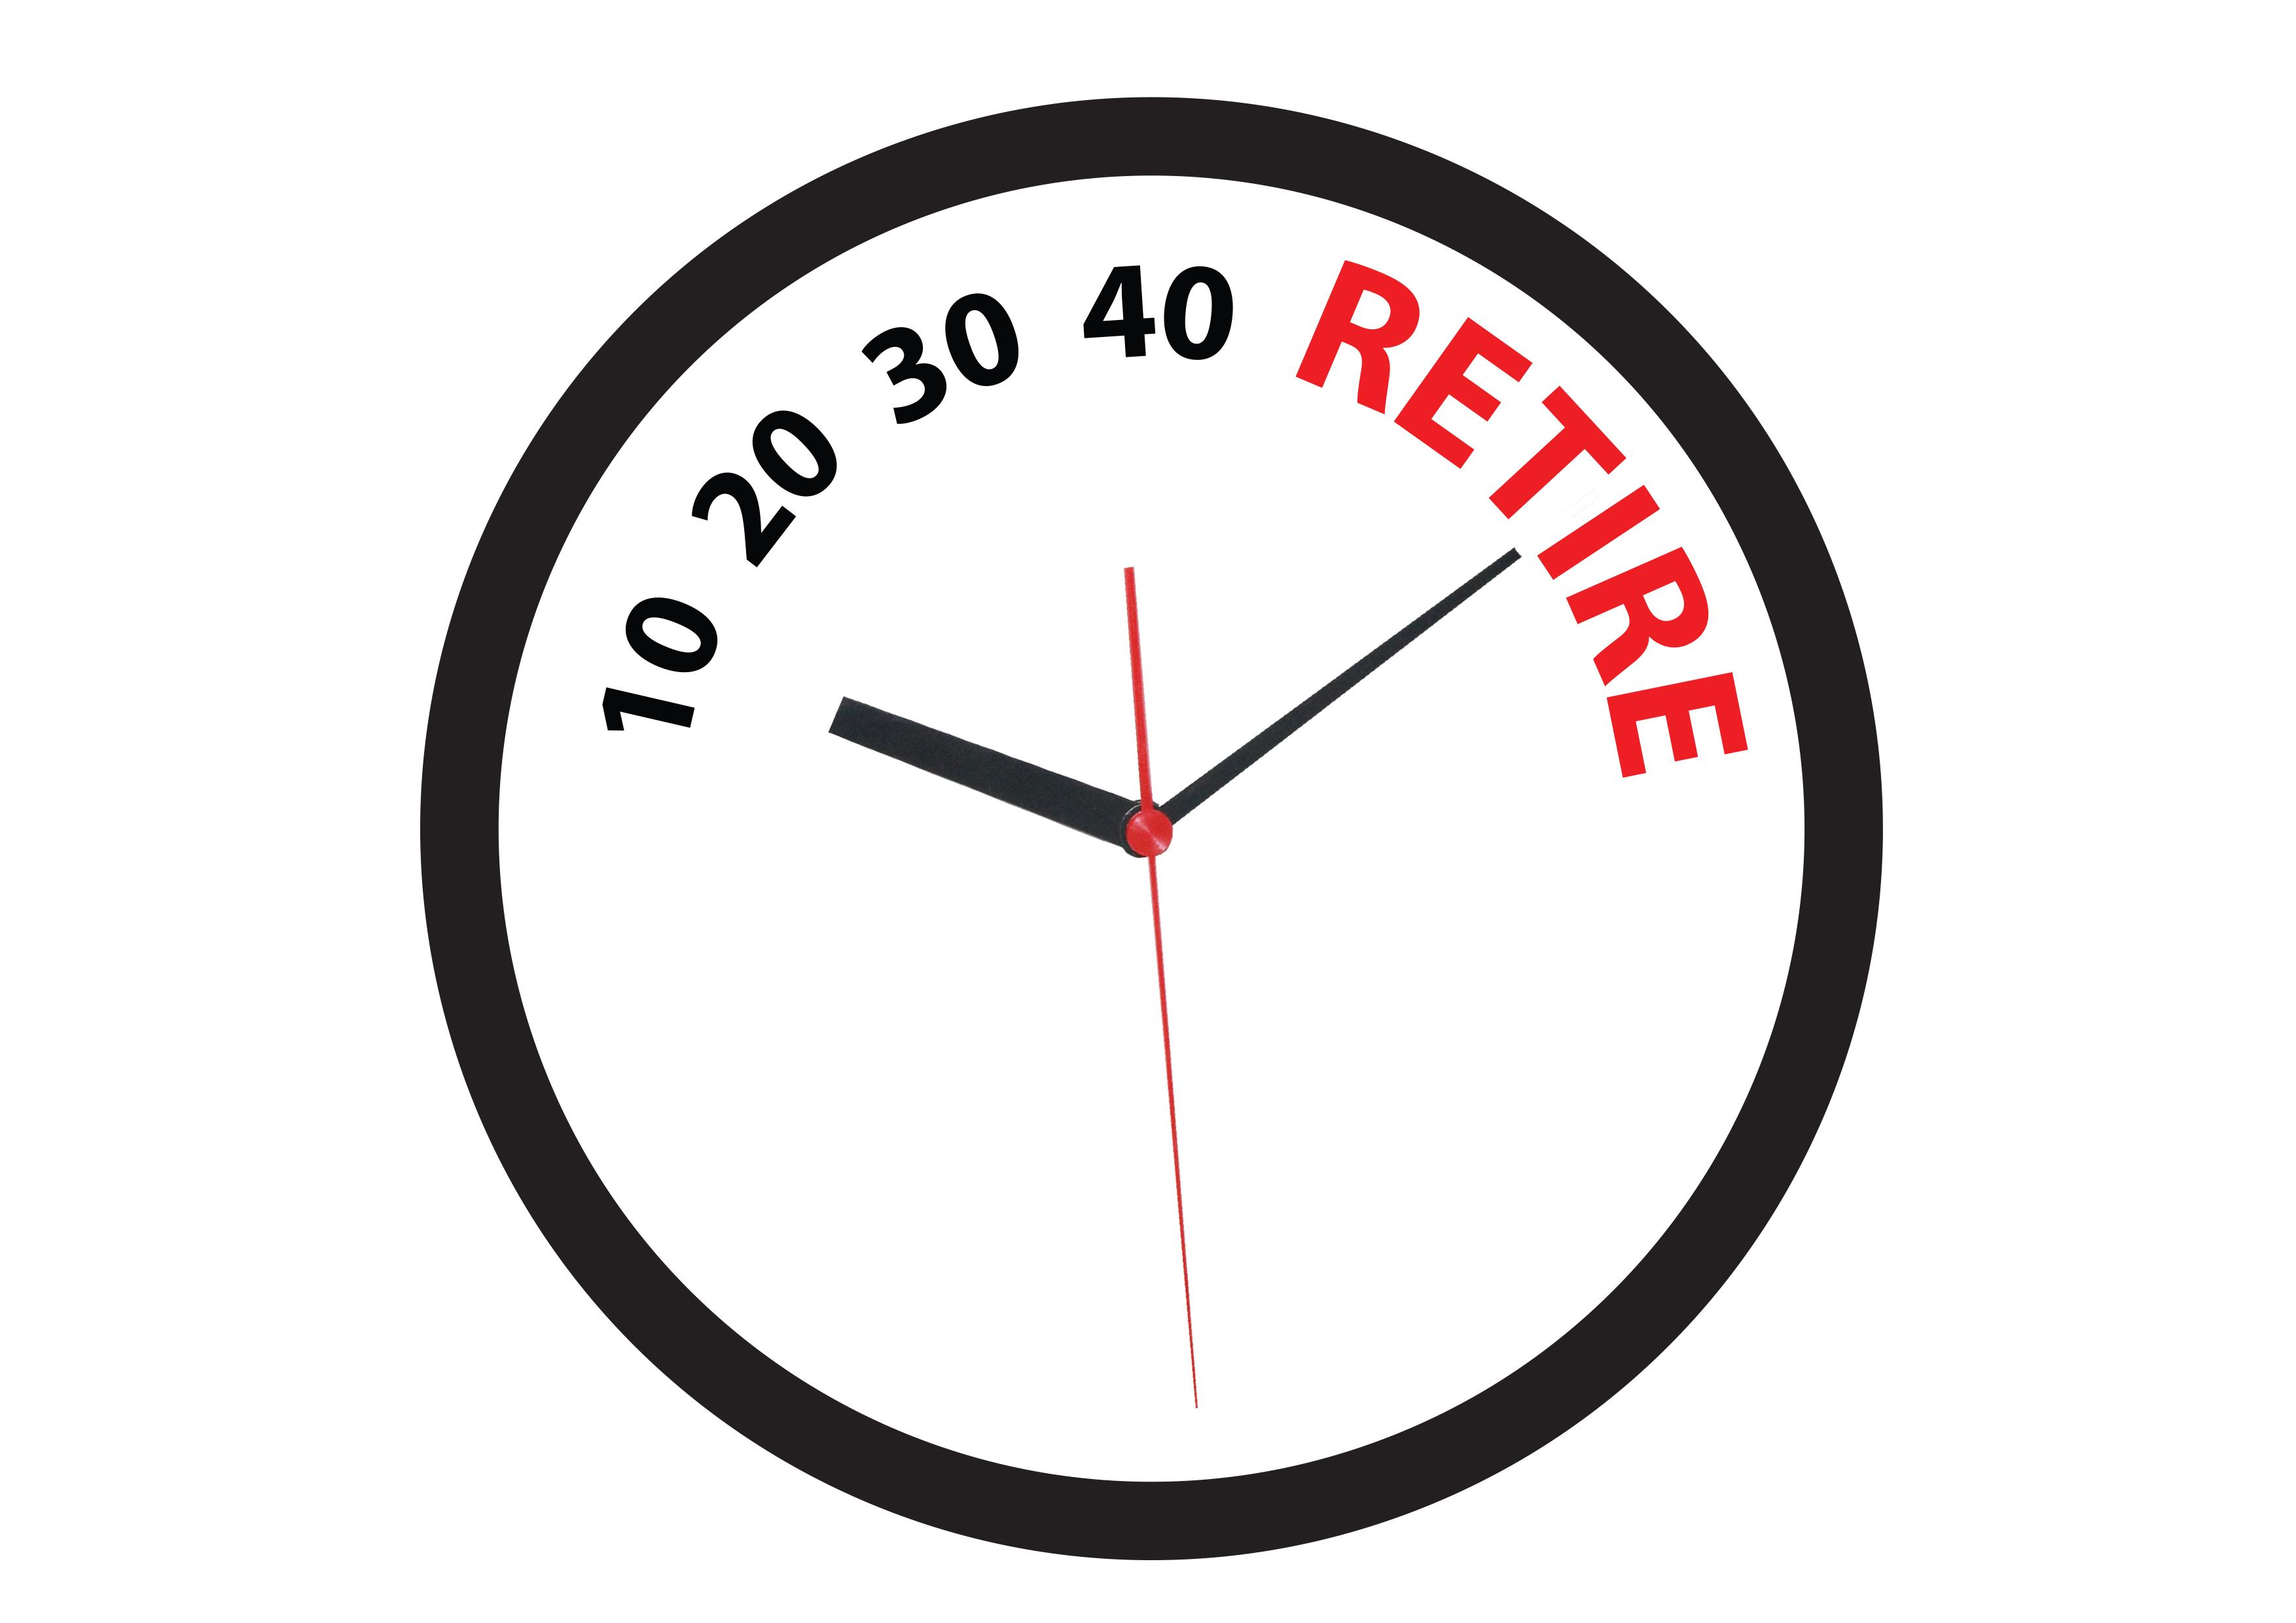 Retire at 40